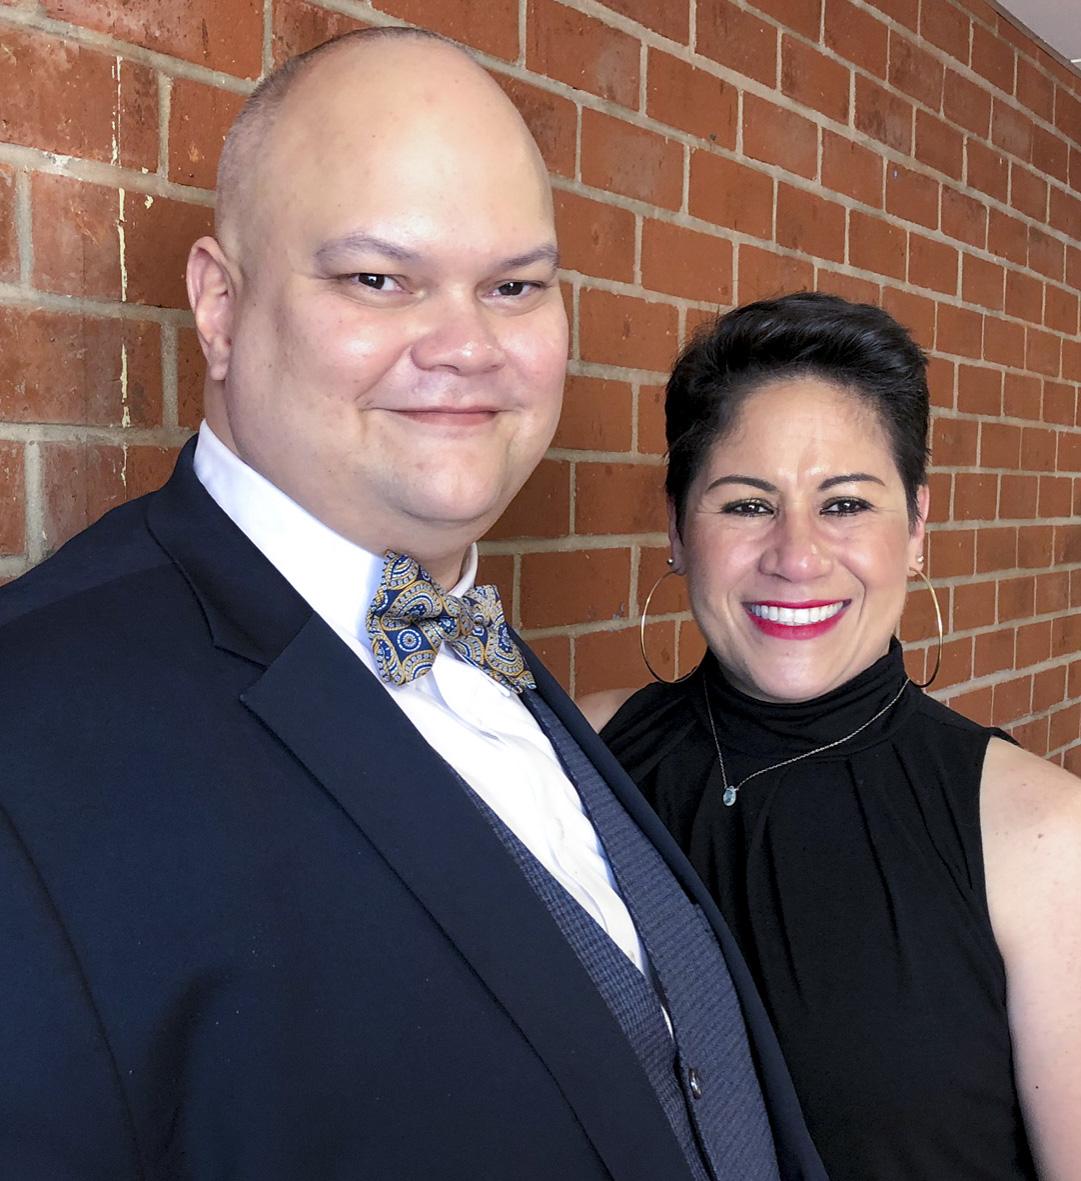 Rev. Richie Sanchez and his wife Jasmine